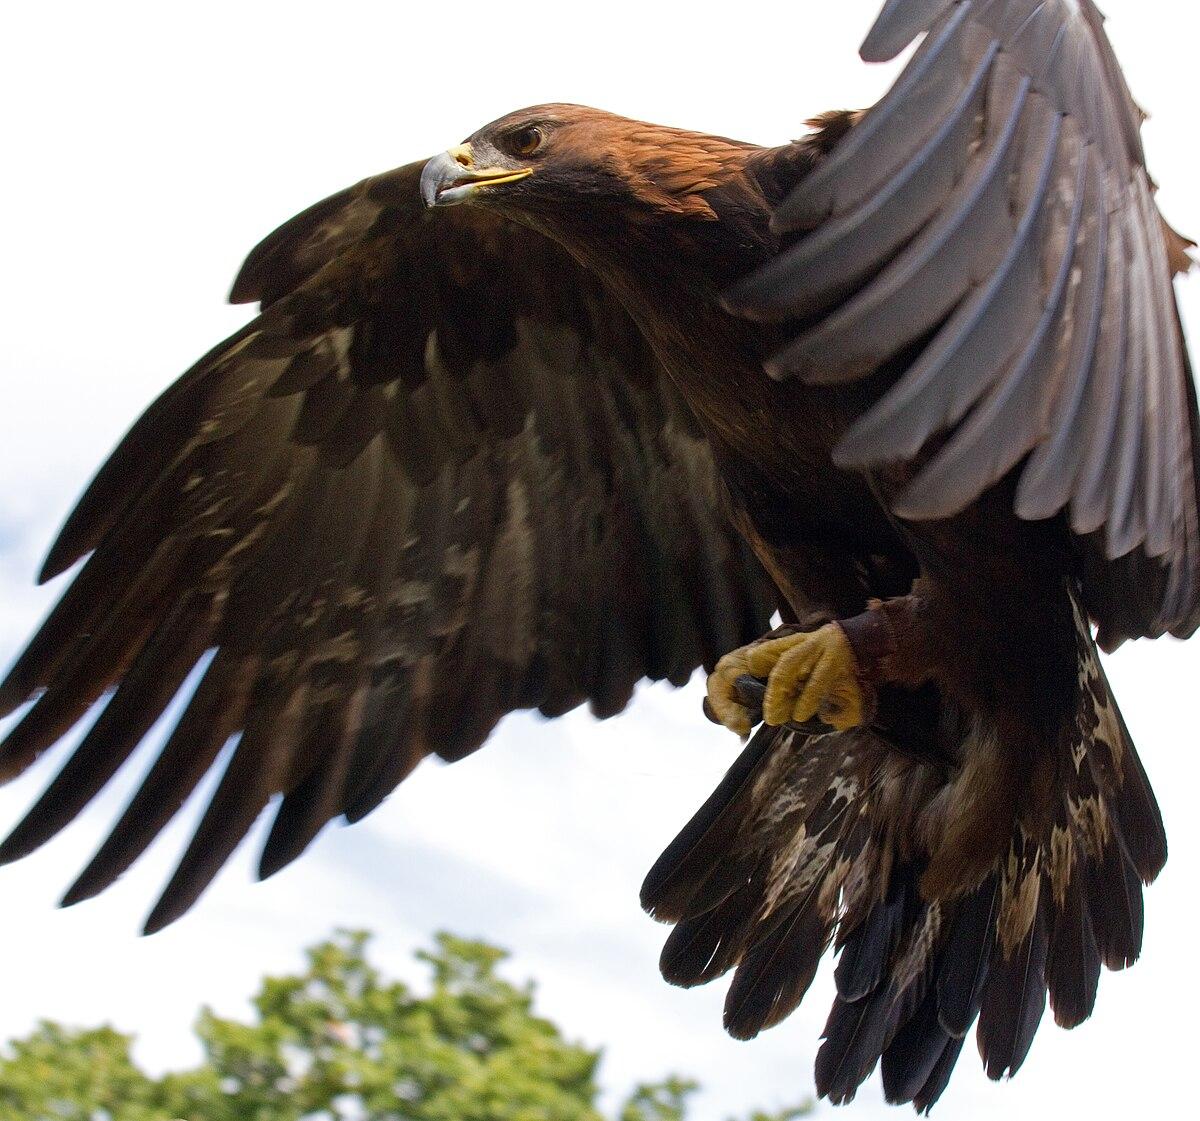 golden eagles in human culture wikipedia